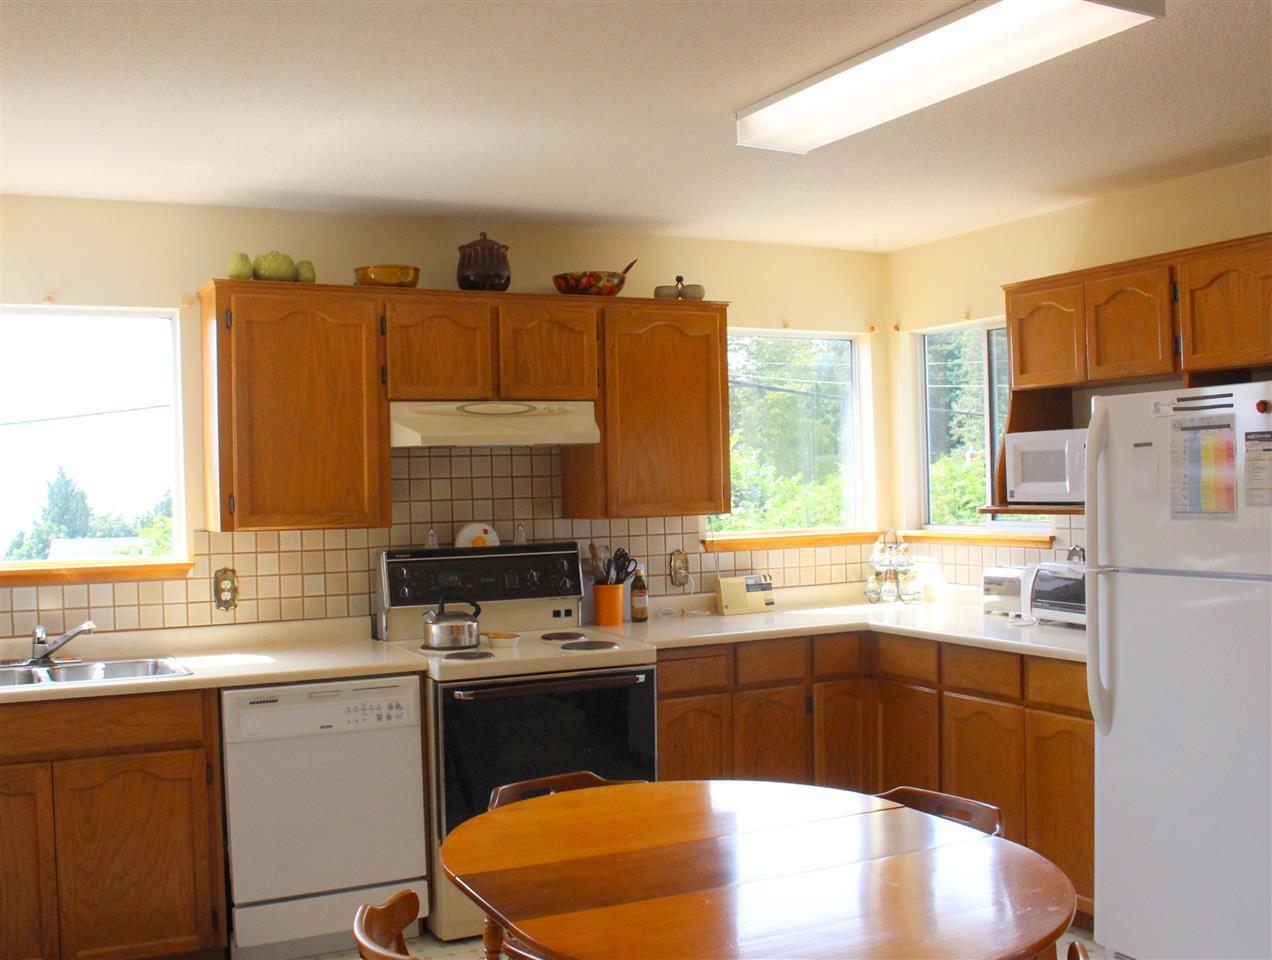 "Photo 8: Photos: 4994 GEER Road in Sechelt: Sechelt District House for sale in ""DAVIS BAY"" (Sunshine Coast)  : MLS®# R2389748"